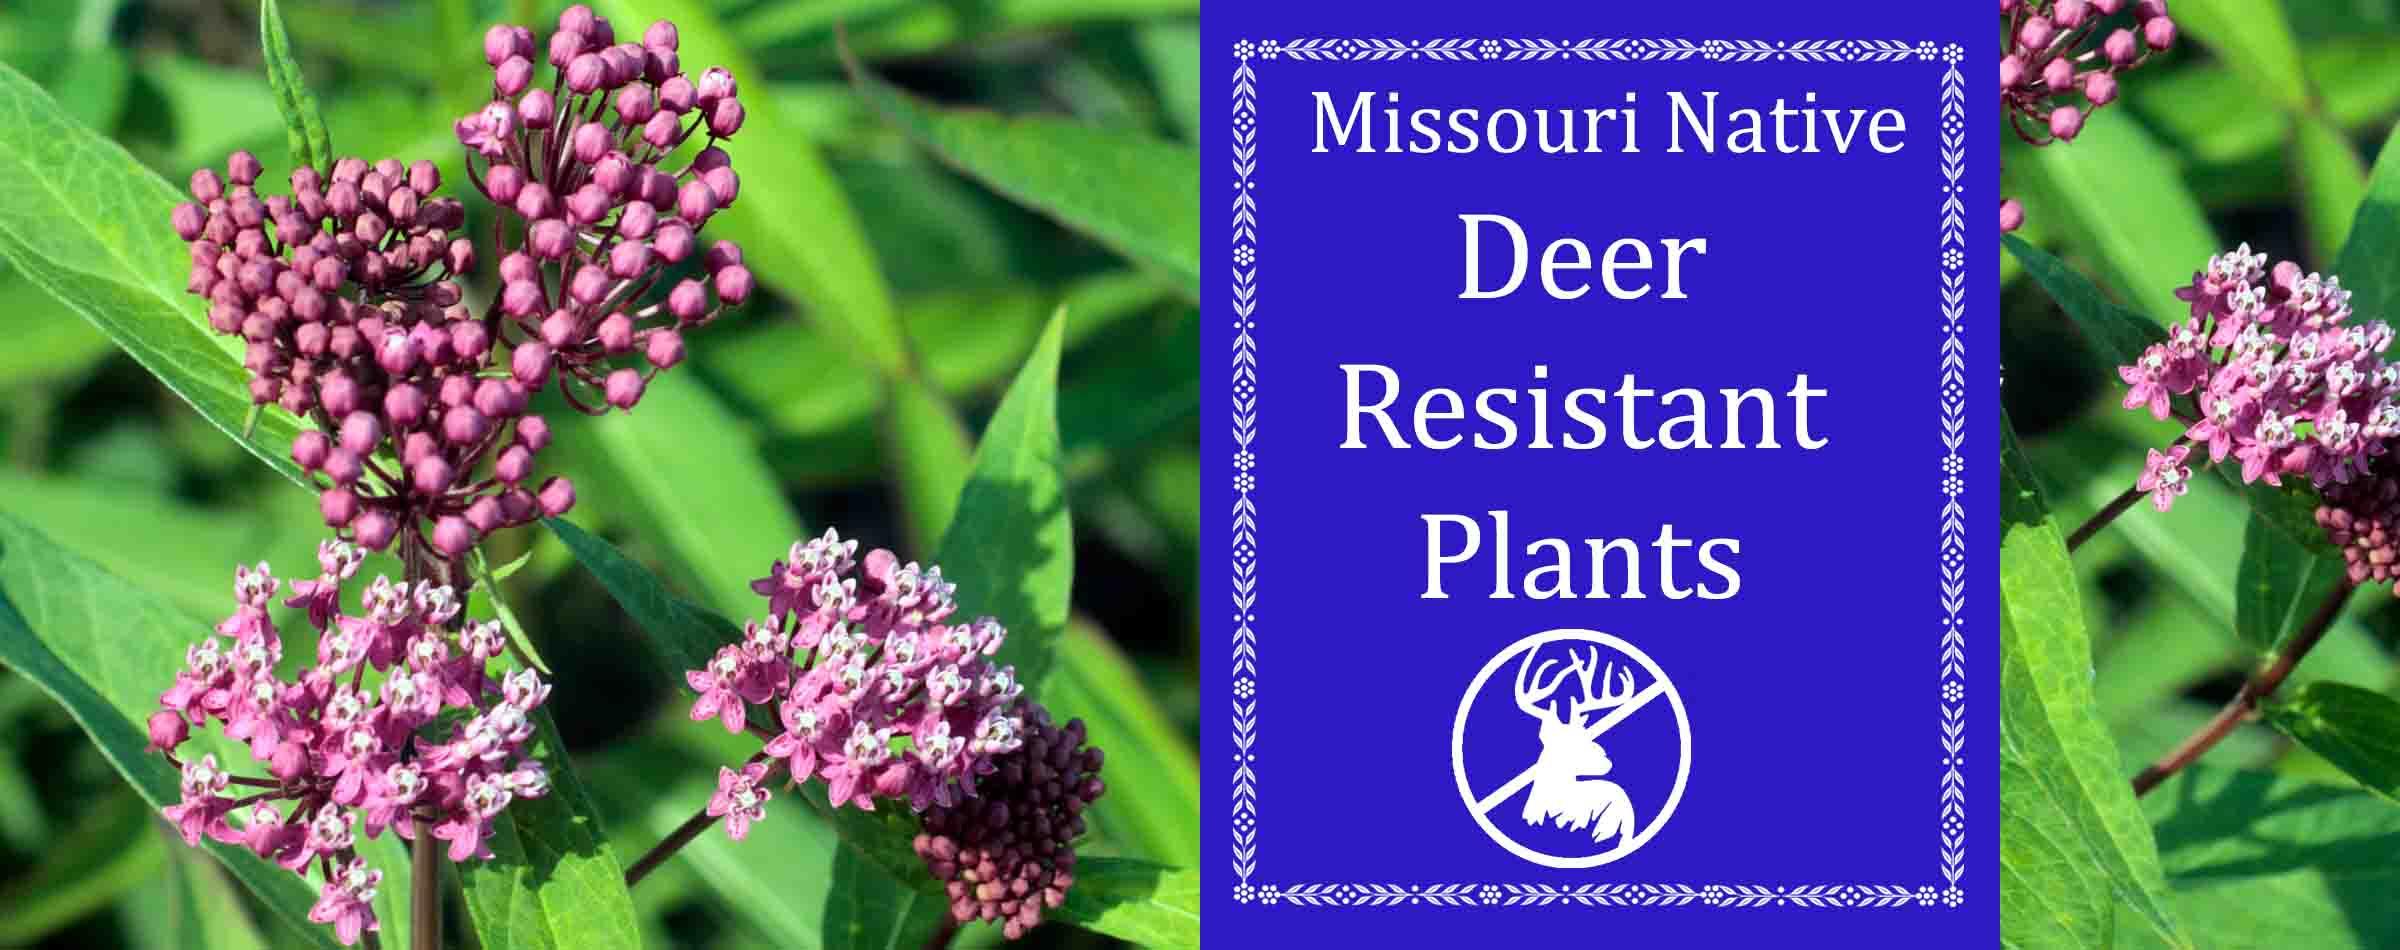 Missouri native deer resistant plants